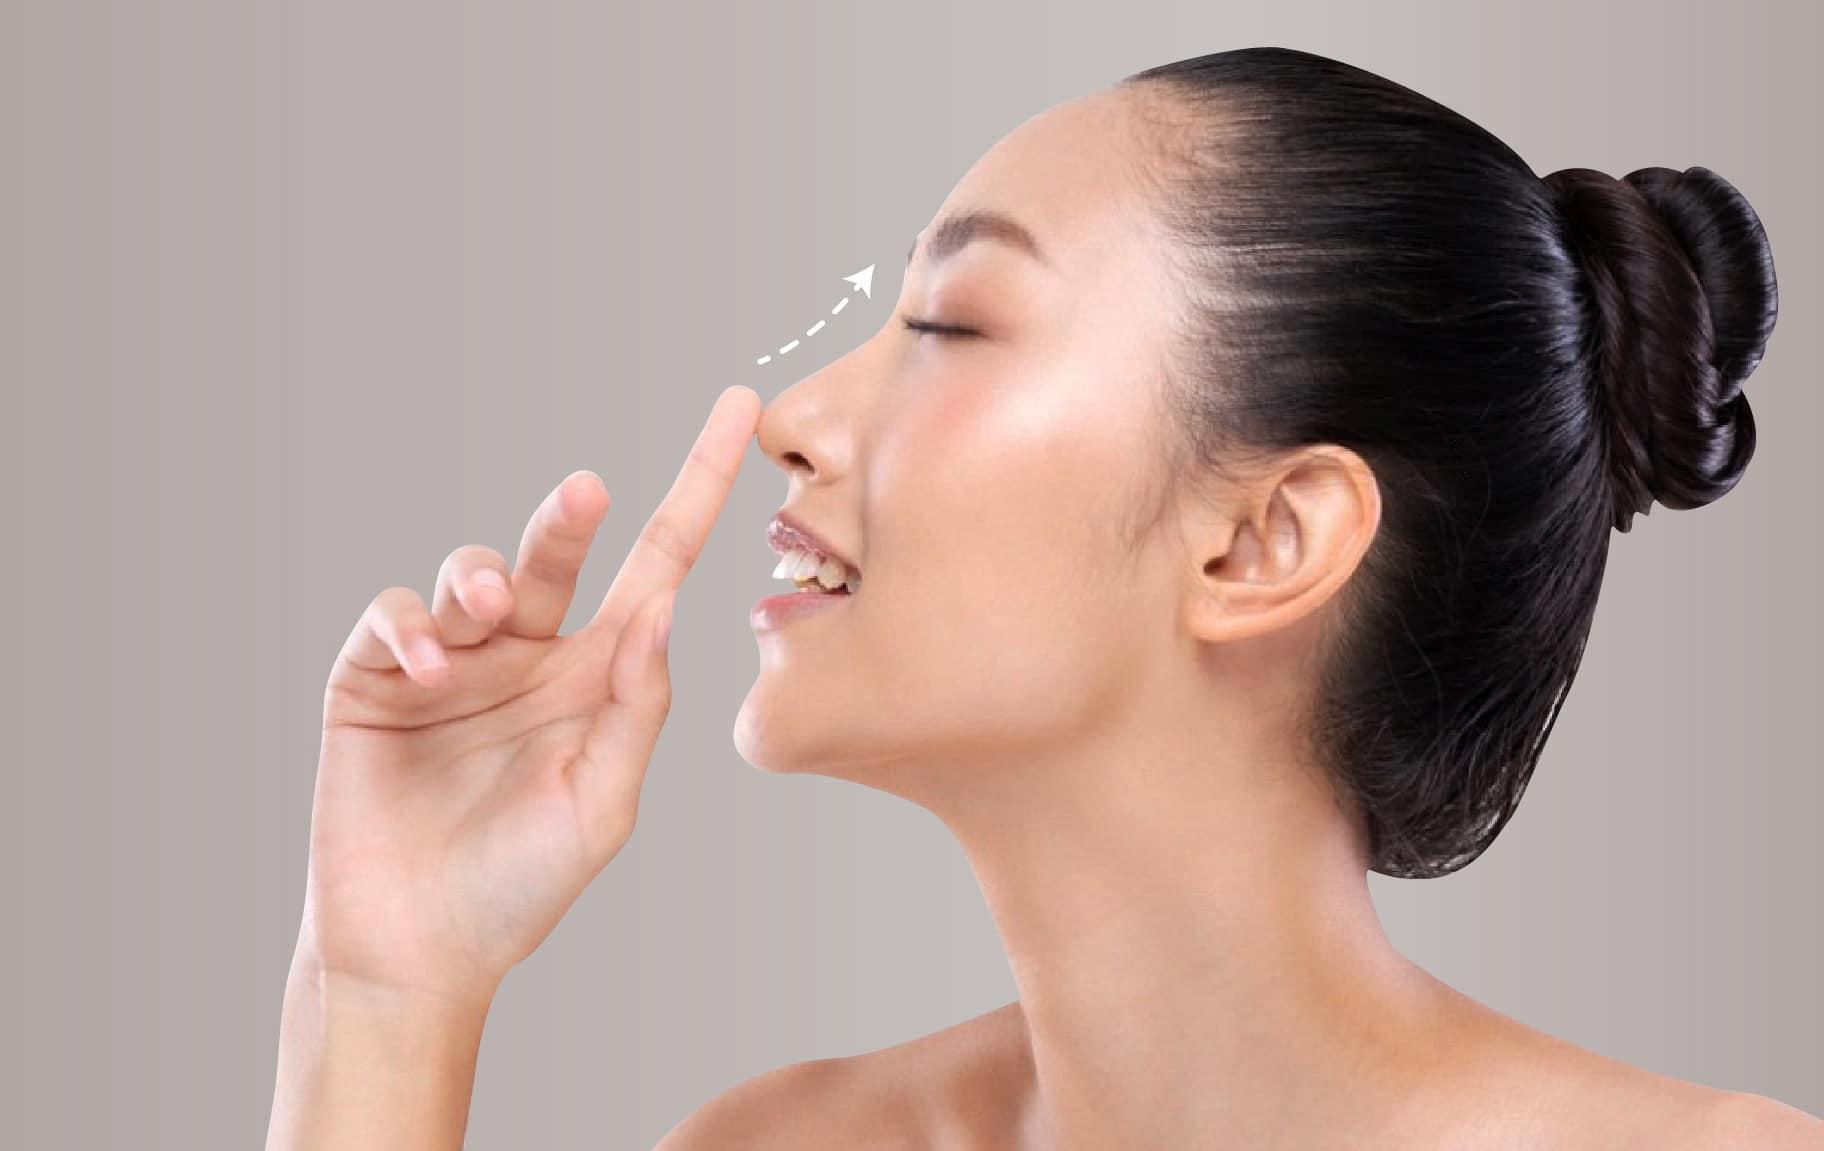 Tanam benang hidung permanen benarkah?